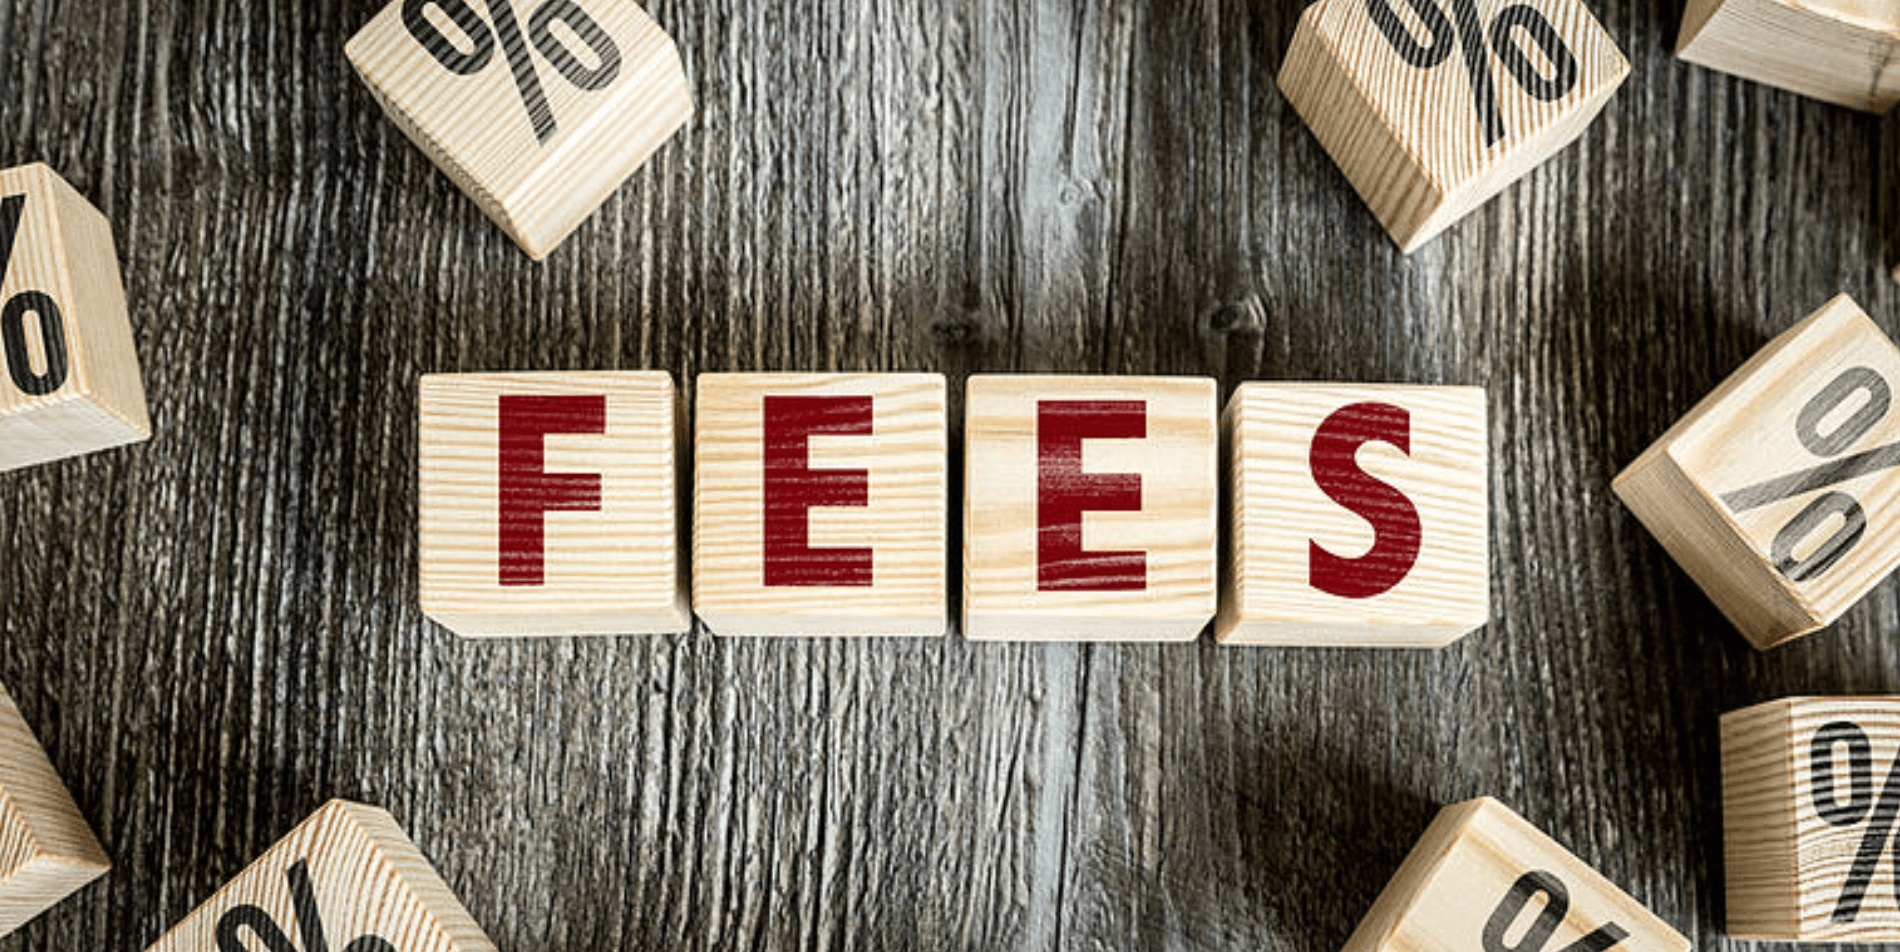 fees (wooden blocks)